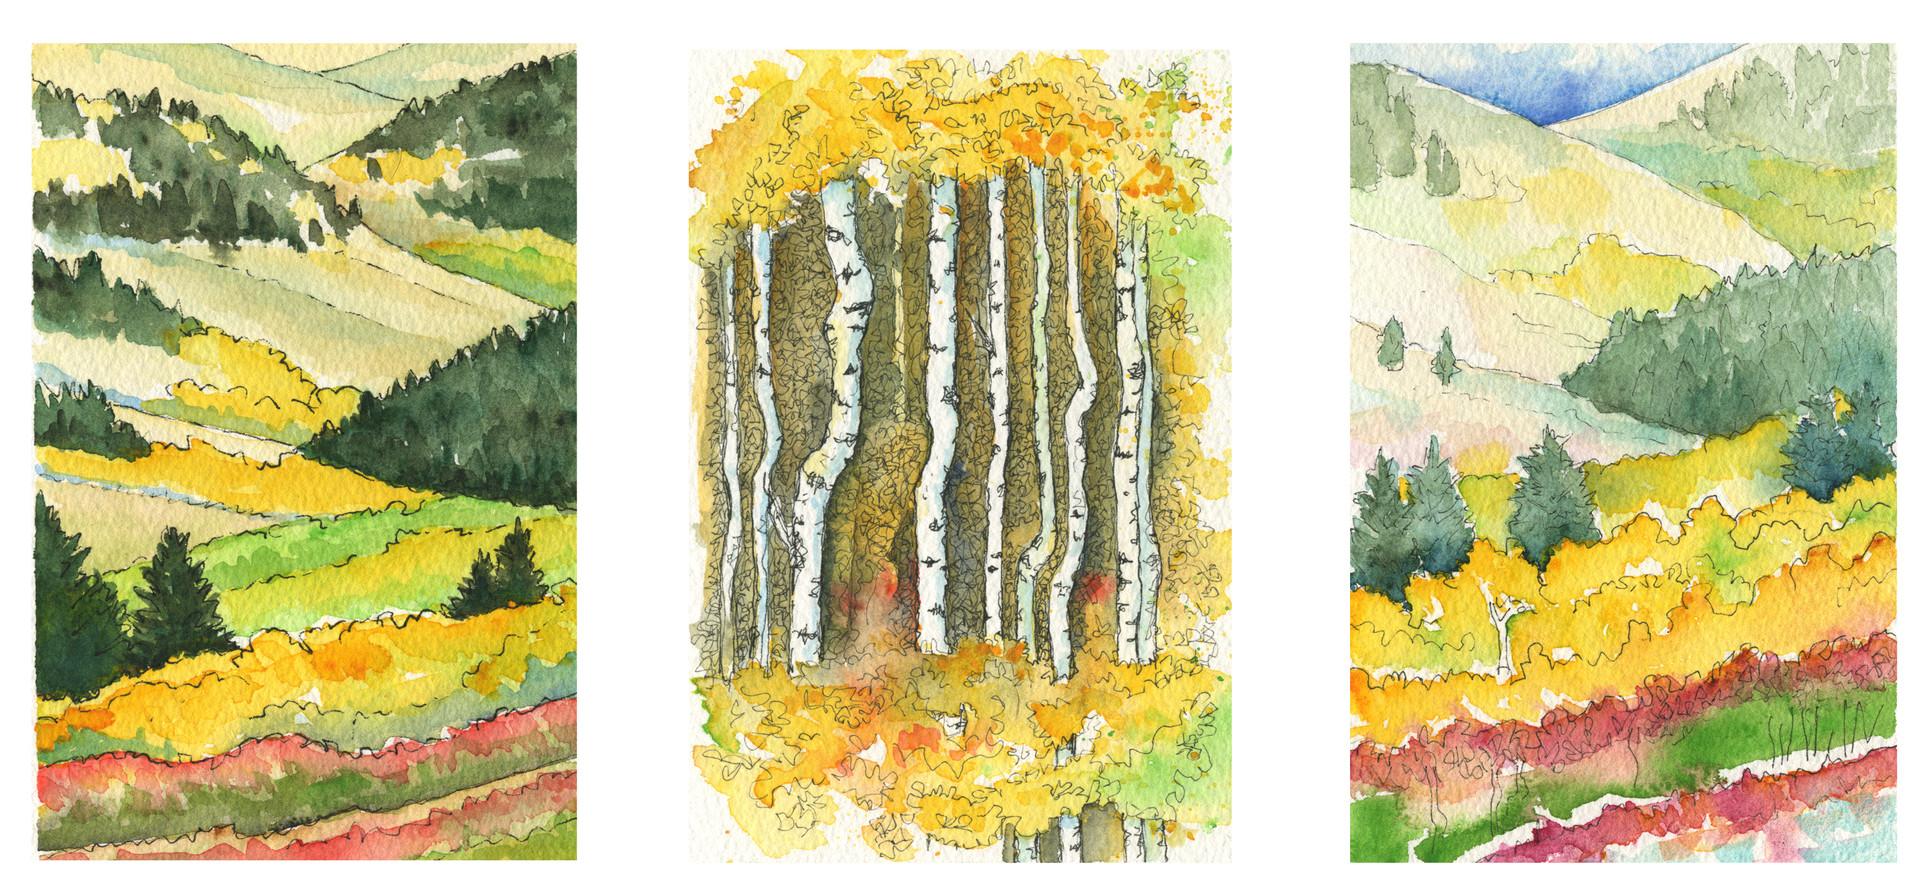 Porcupine Hills Sketches